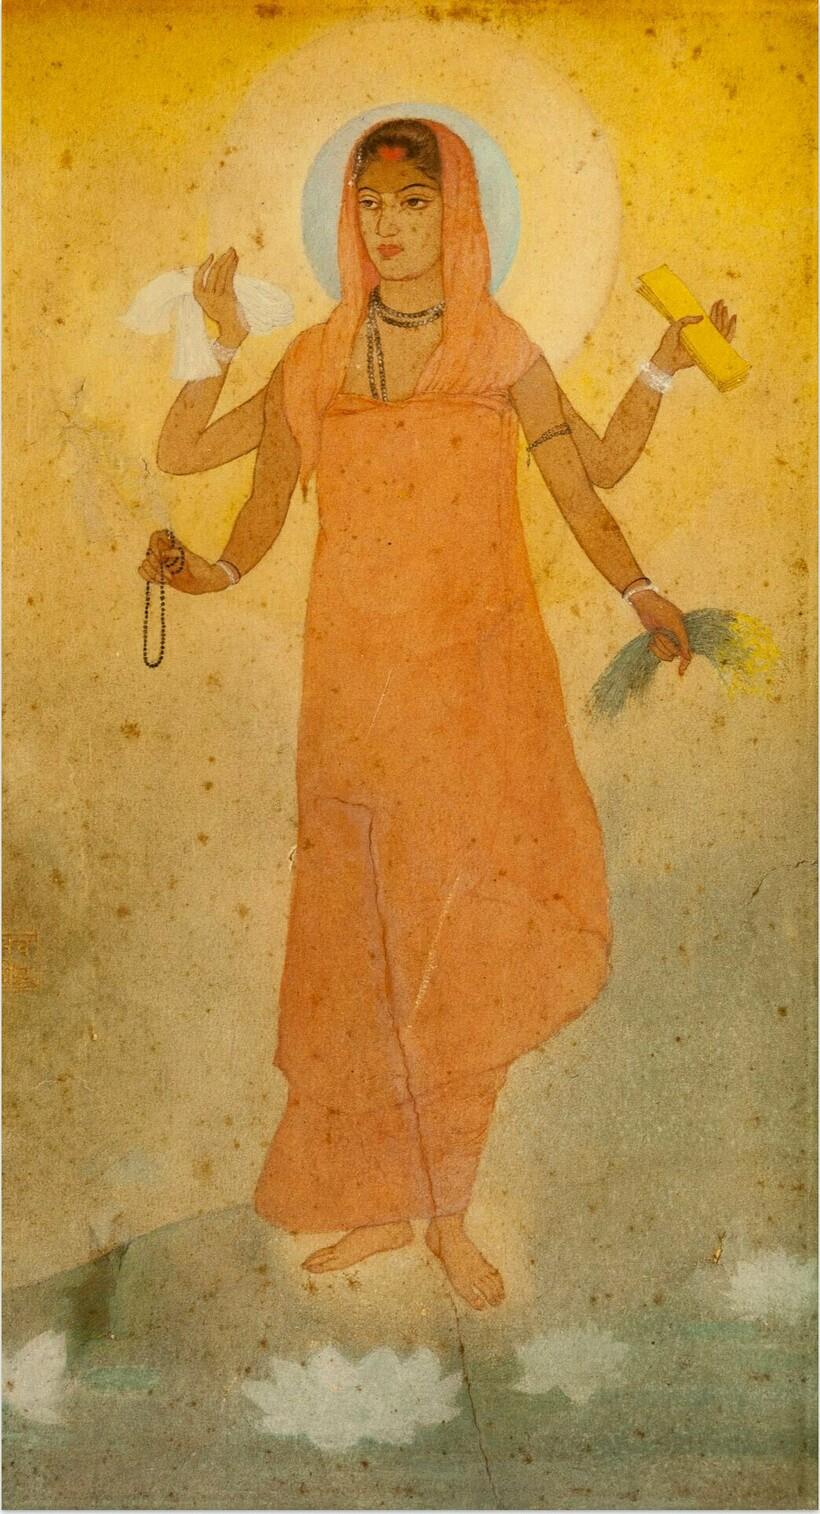 Образ Матери-Индии